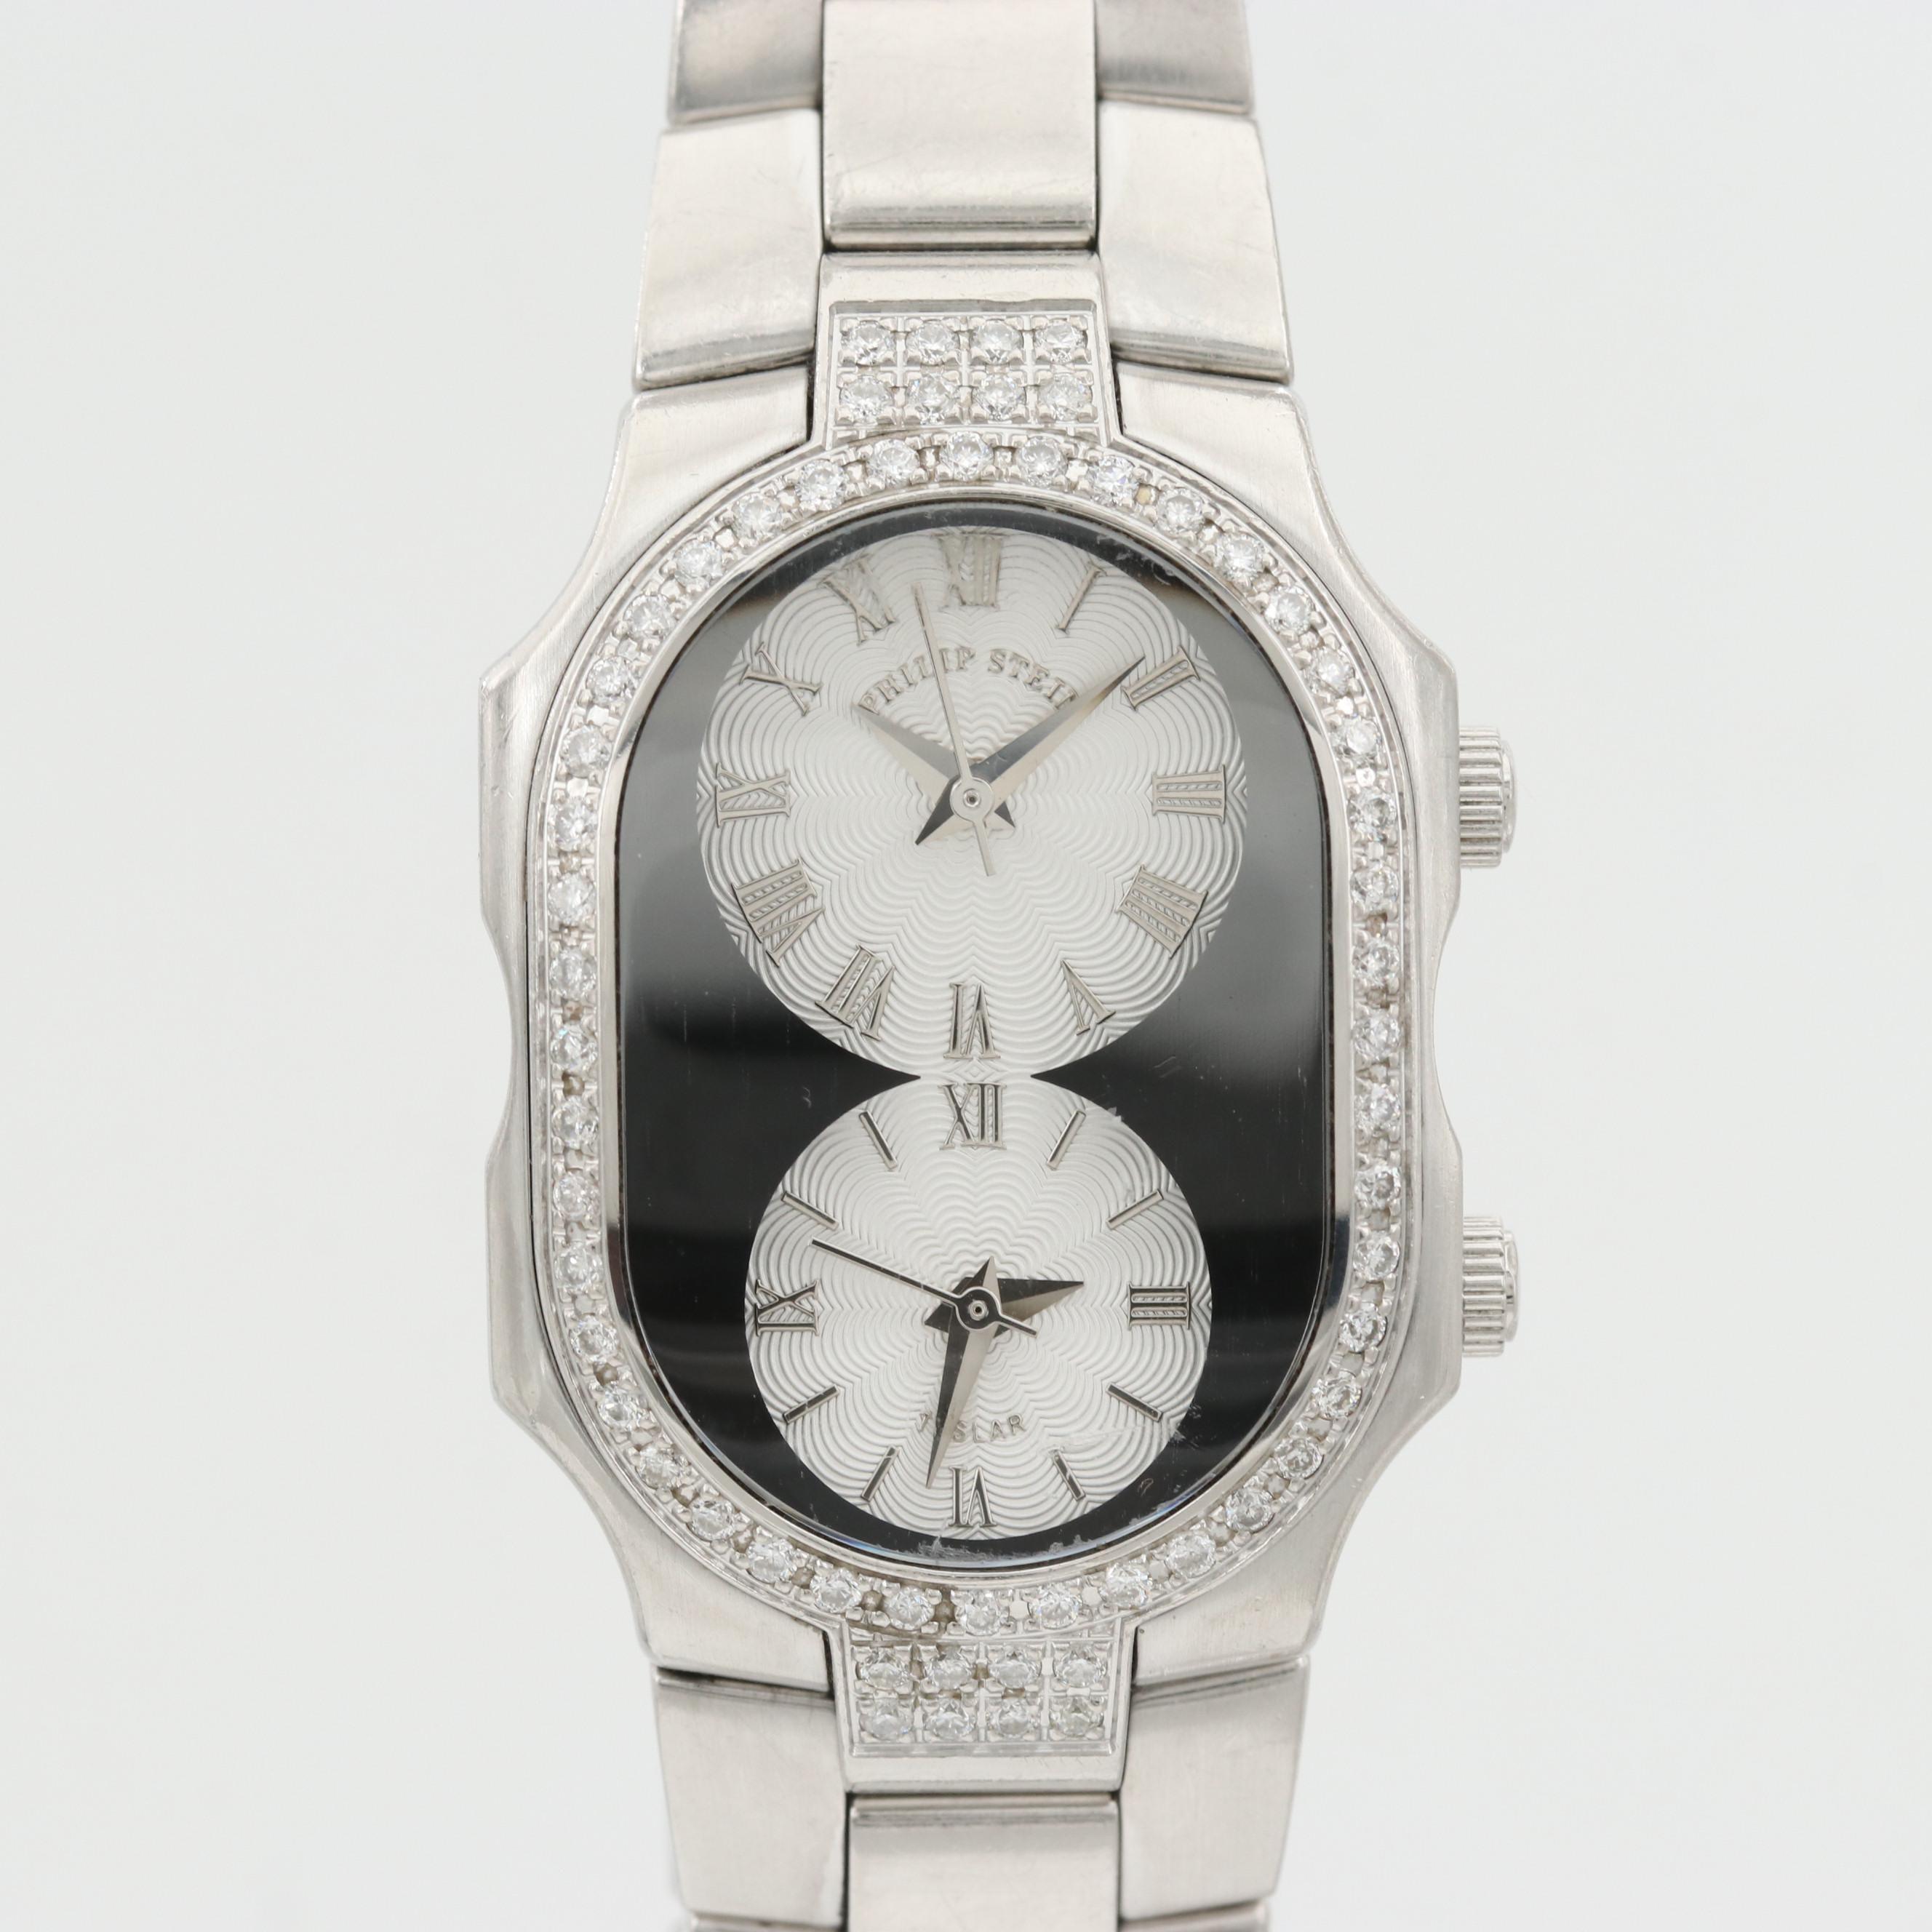 Philip Stein Teslar Dual Time 2.34 CTW Diamond and St. Steel Quartz Wristwatch